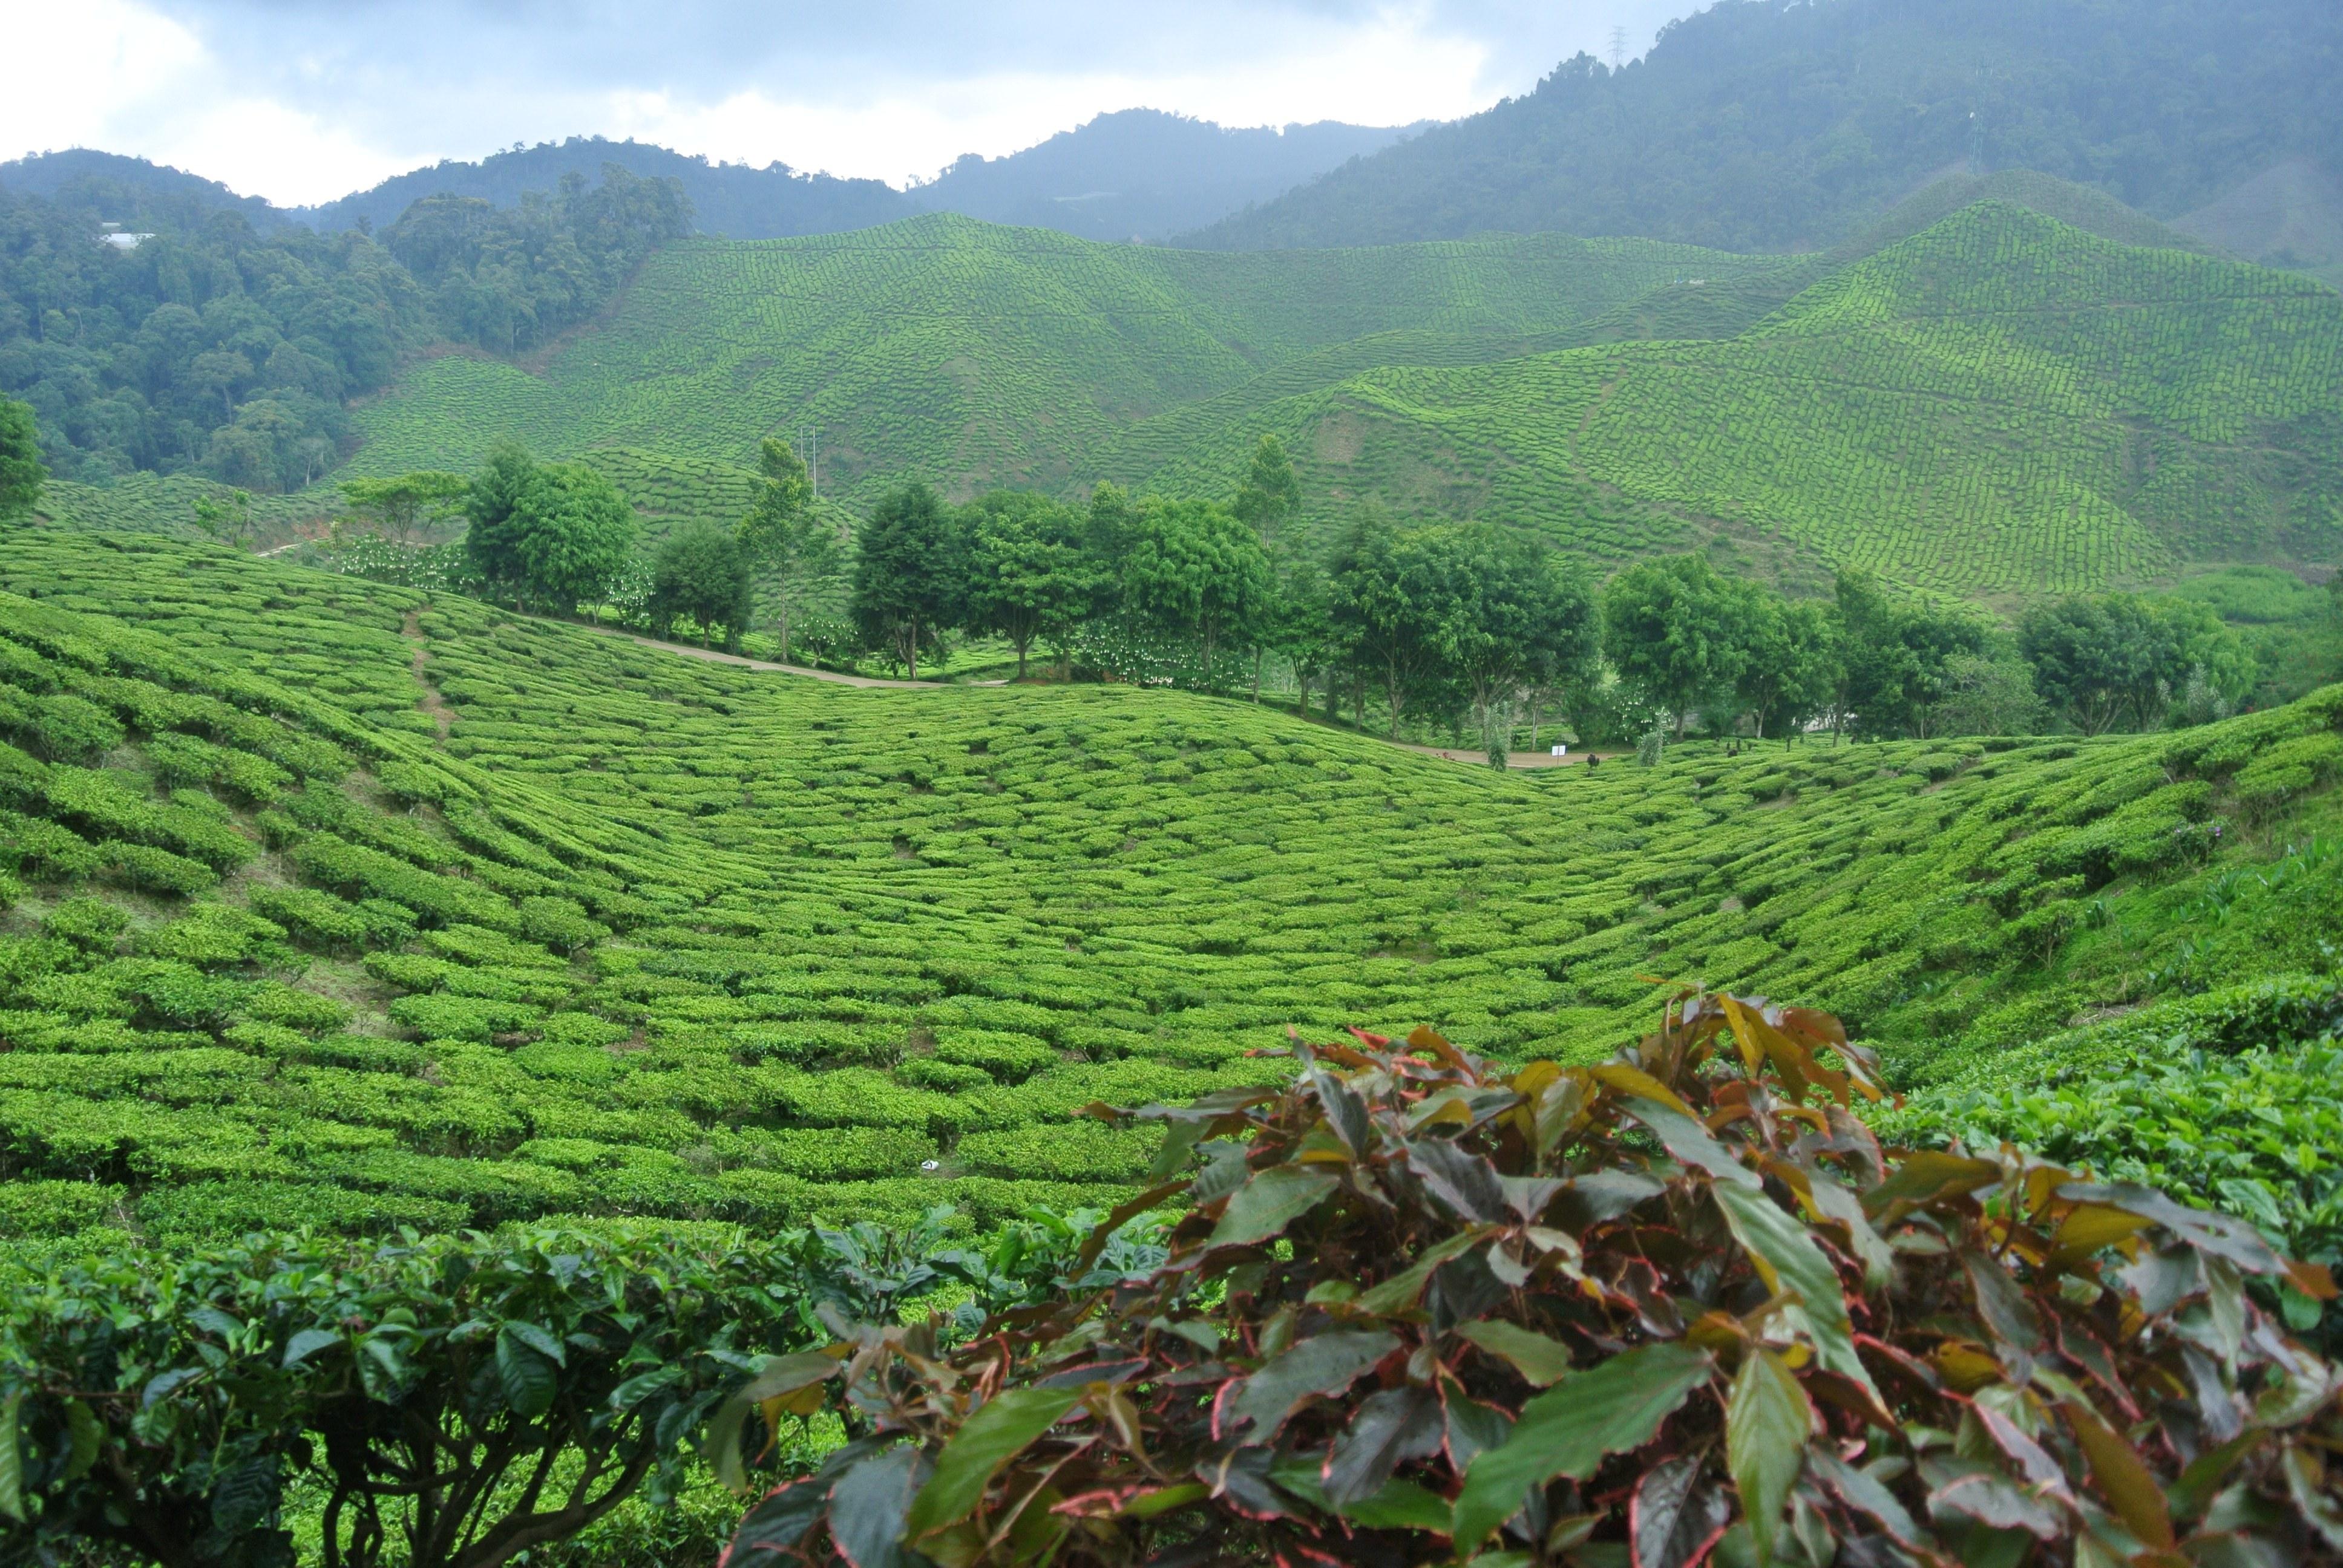 Tea Plantation, Cameron Highlands, Malaysia | Todd's Travels Travel Blog